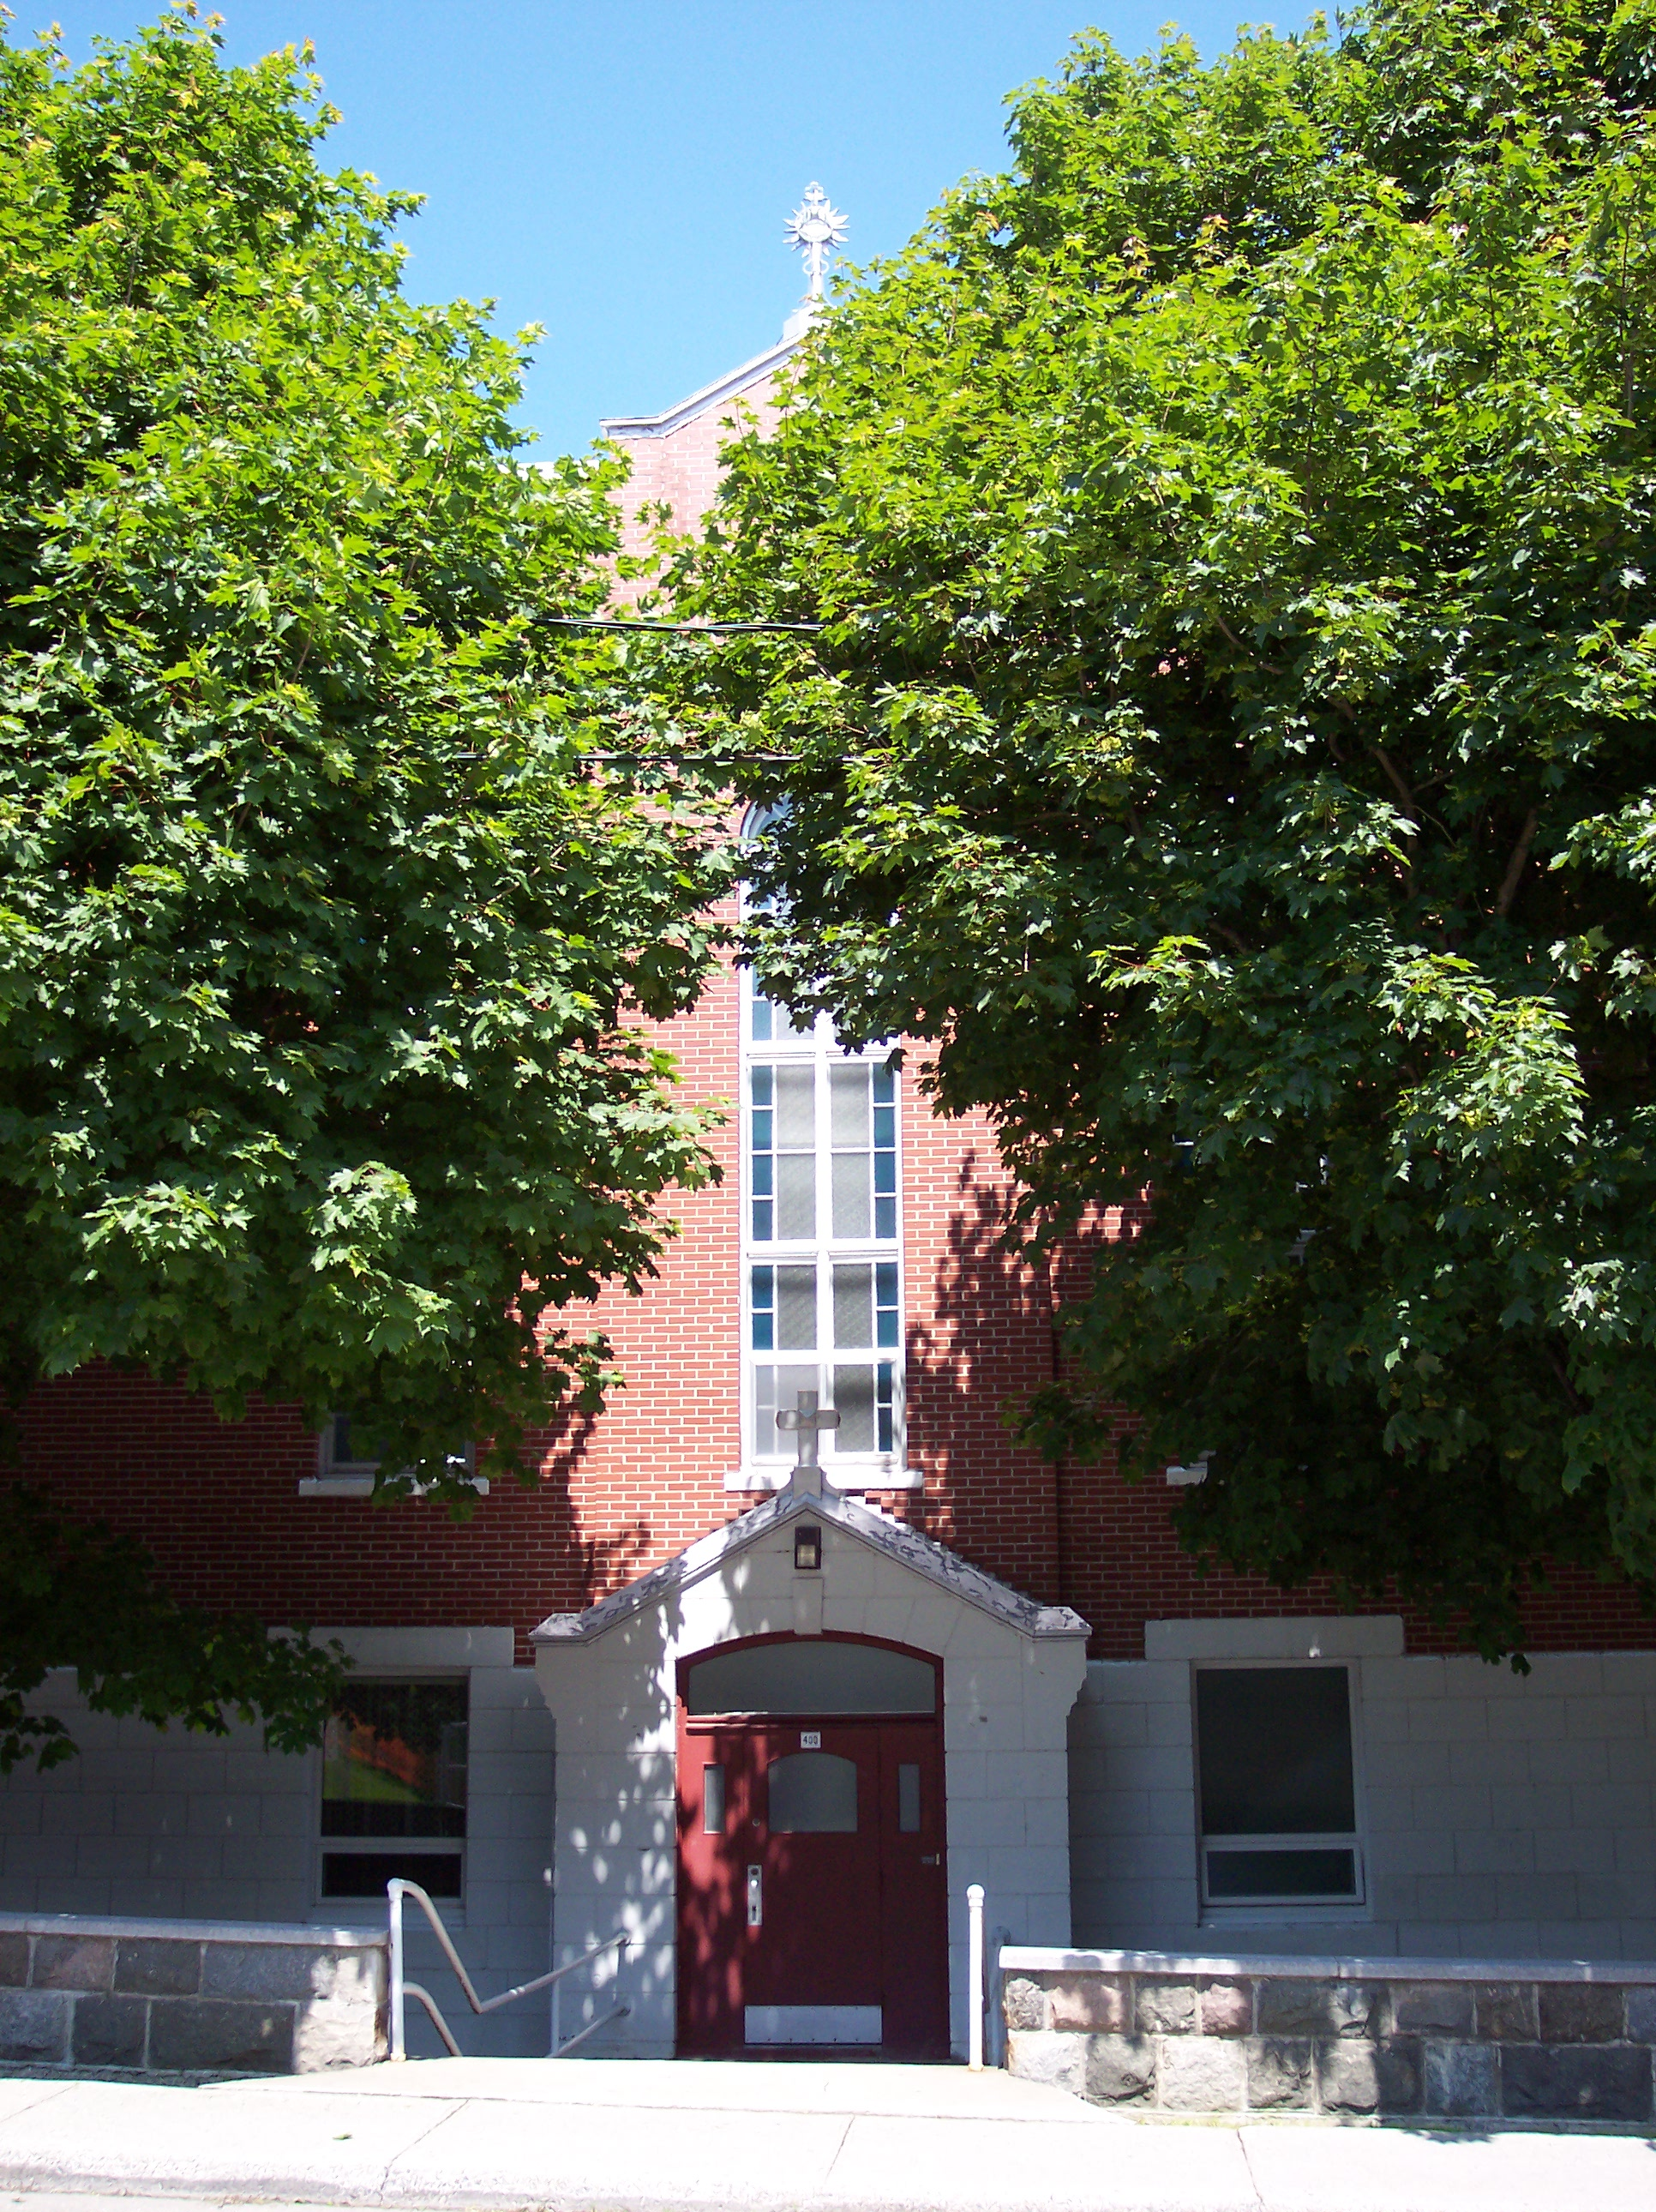 1788 - 400, rue La Salle